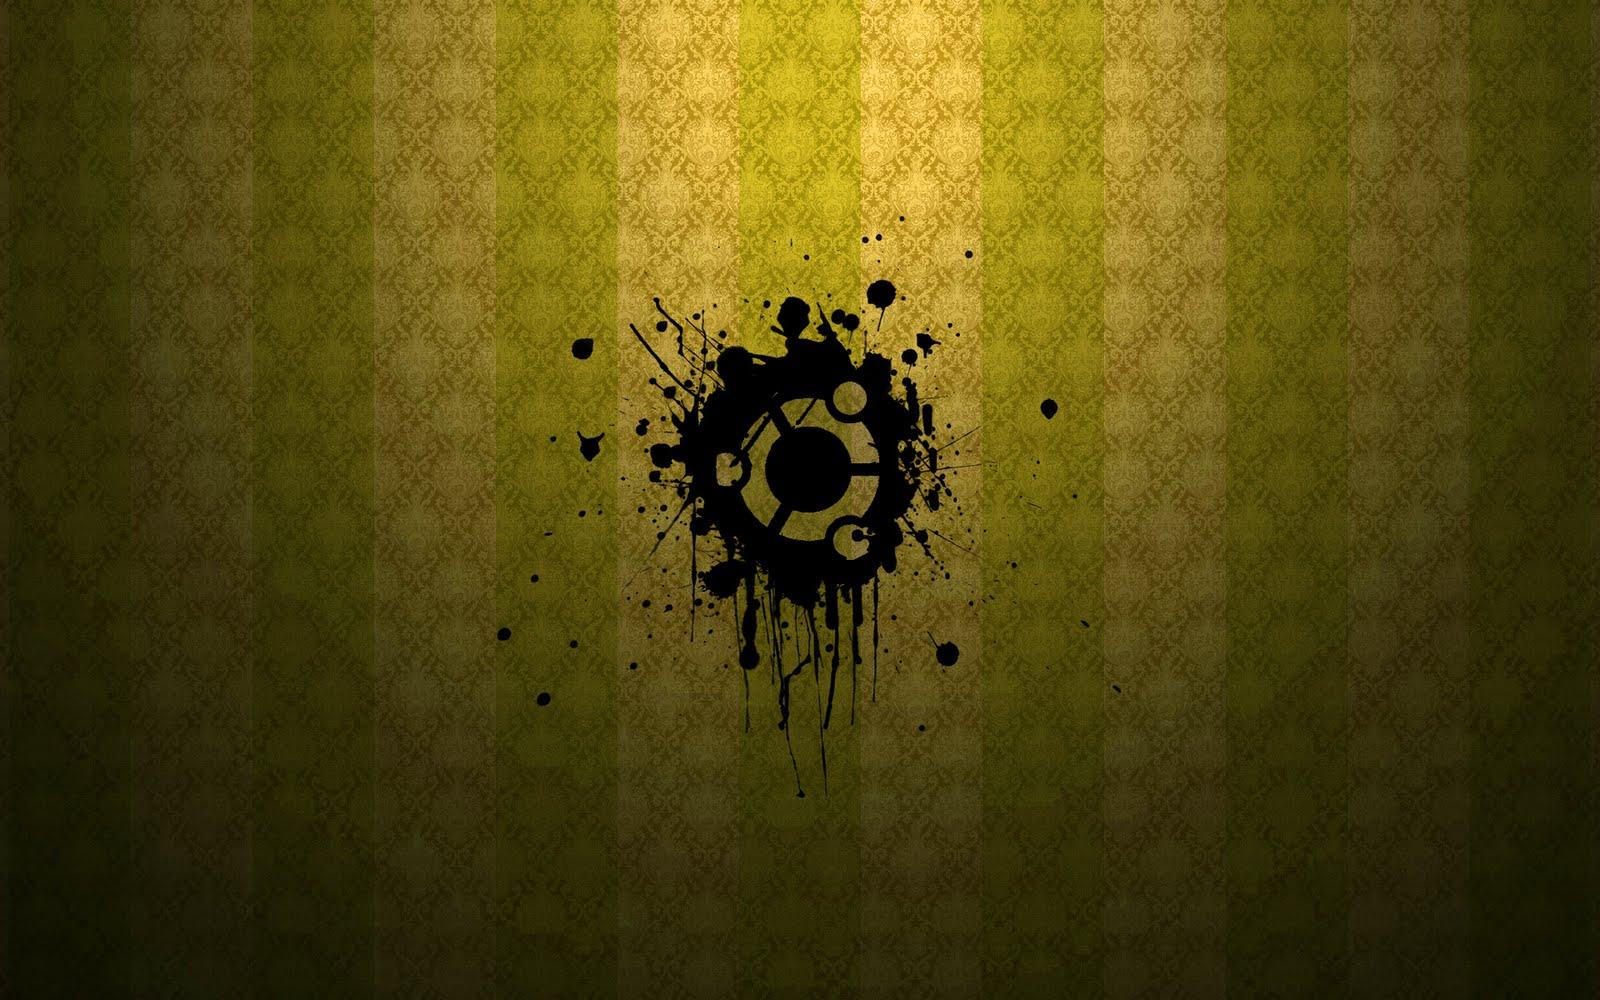 http://3.bp.blogspot.com/_2UbsSBz9ckE/Sym5-3cgroI/AAAAAAAAAoY/rZw0xNSFYCM/s1600/Ubuntu_Splatter_hd_wallpaper.jpg